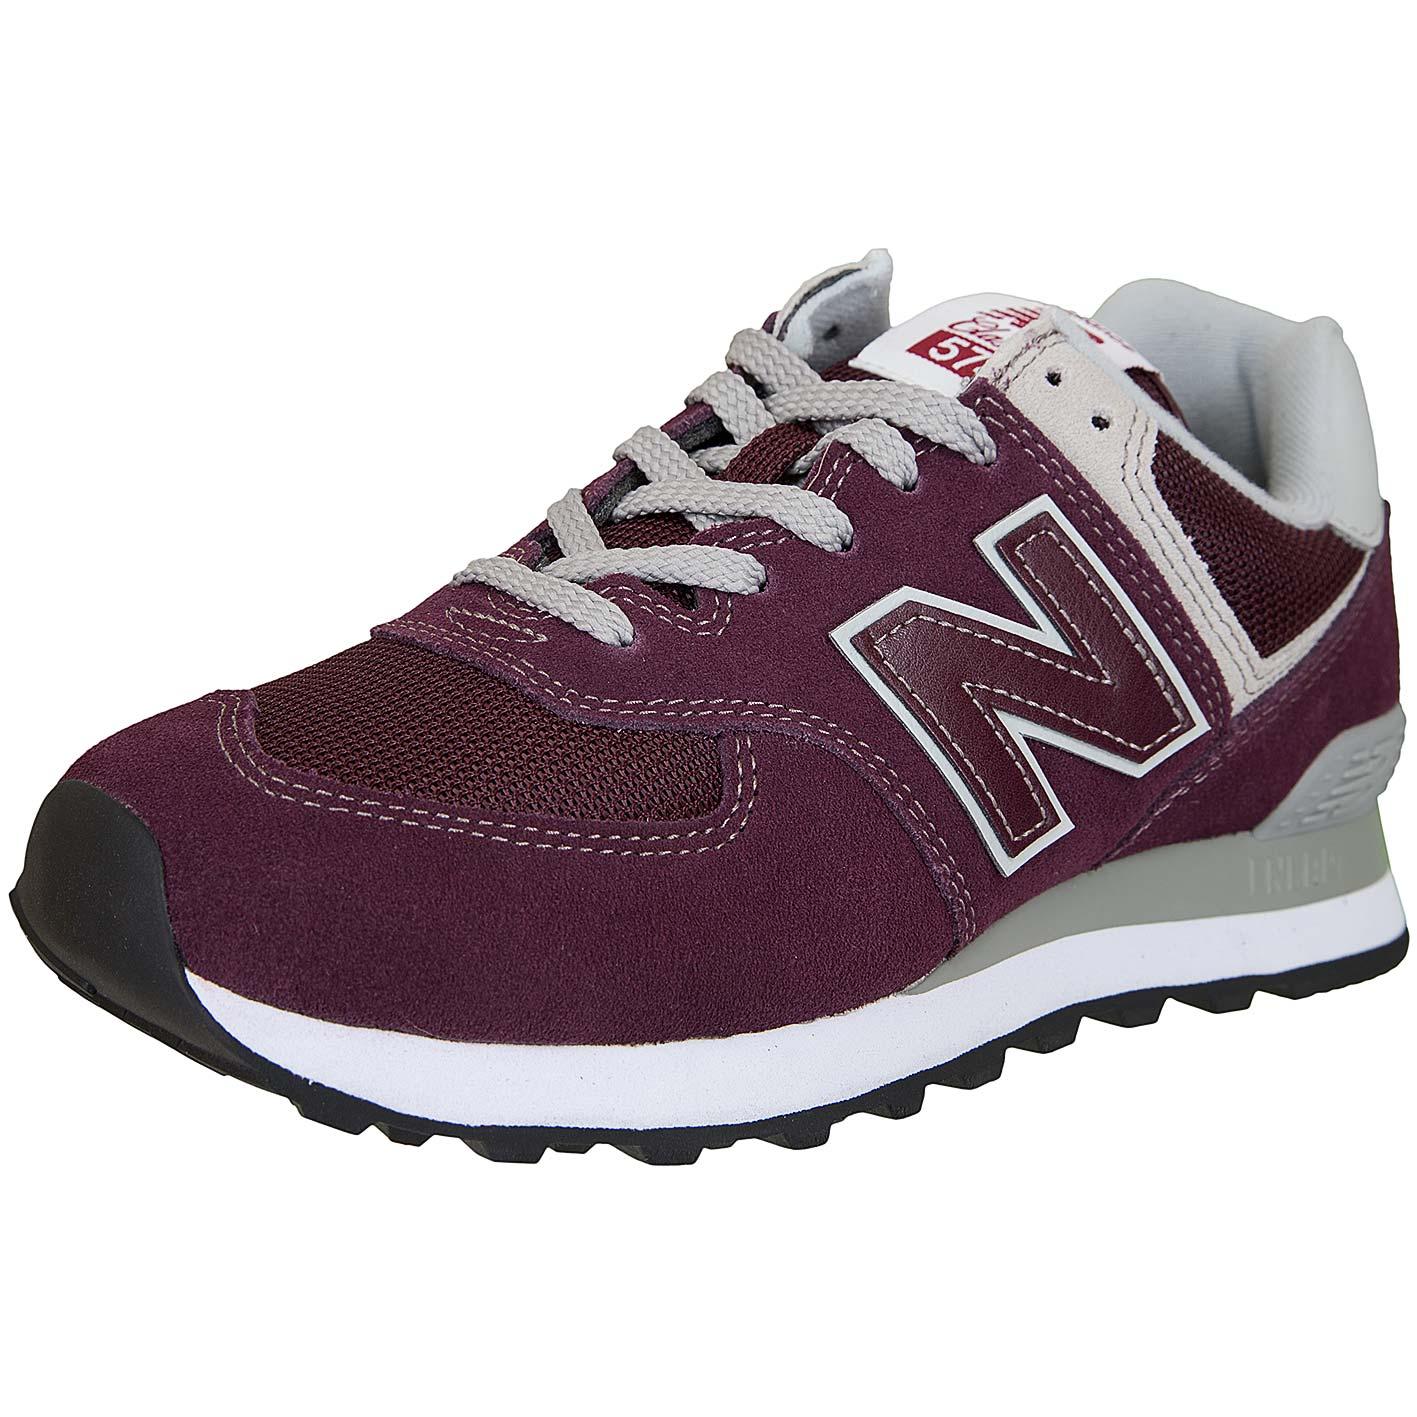 lowest price 55e03 e1cbb New Balance Sneaker 574 Wildleder/Mesh/Synthetik weinrot